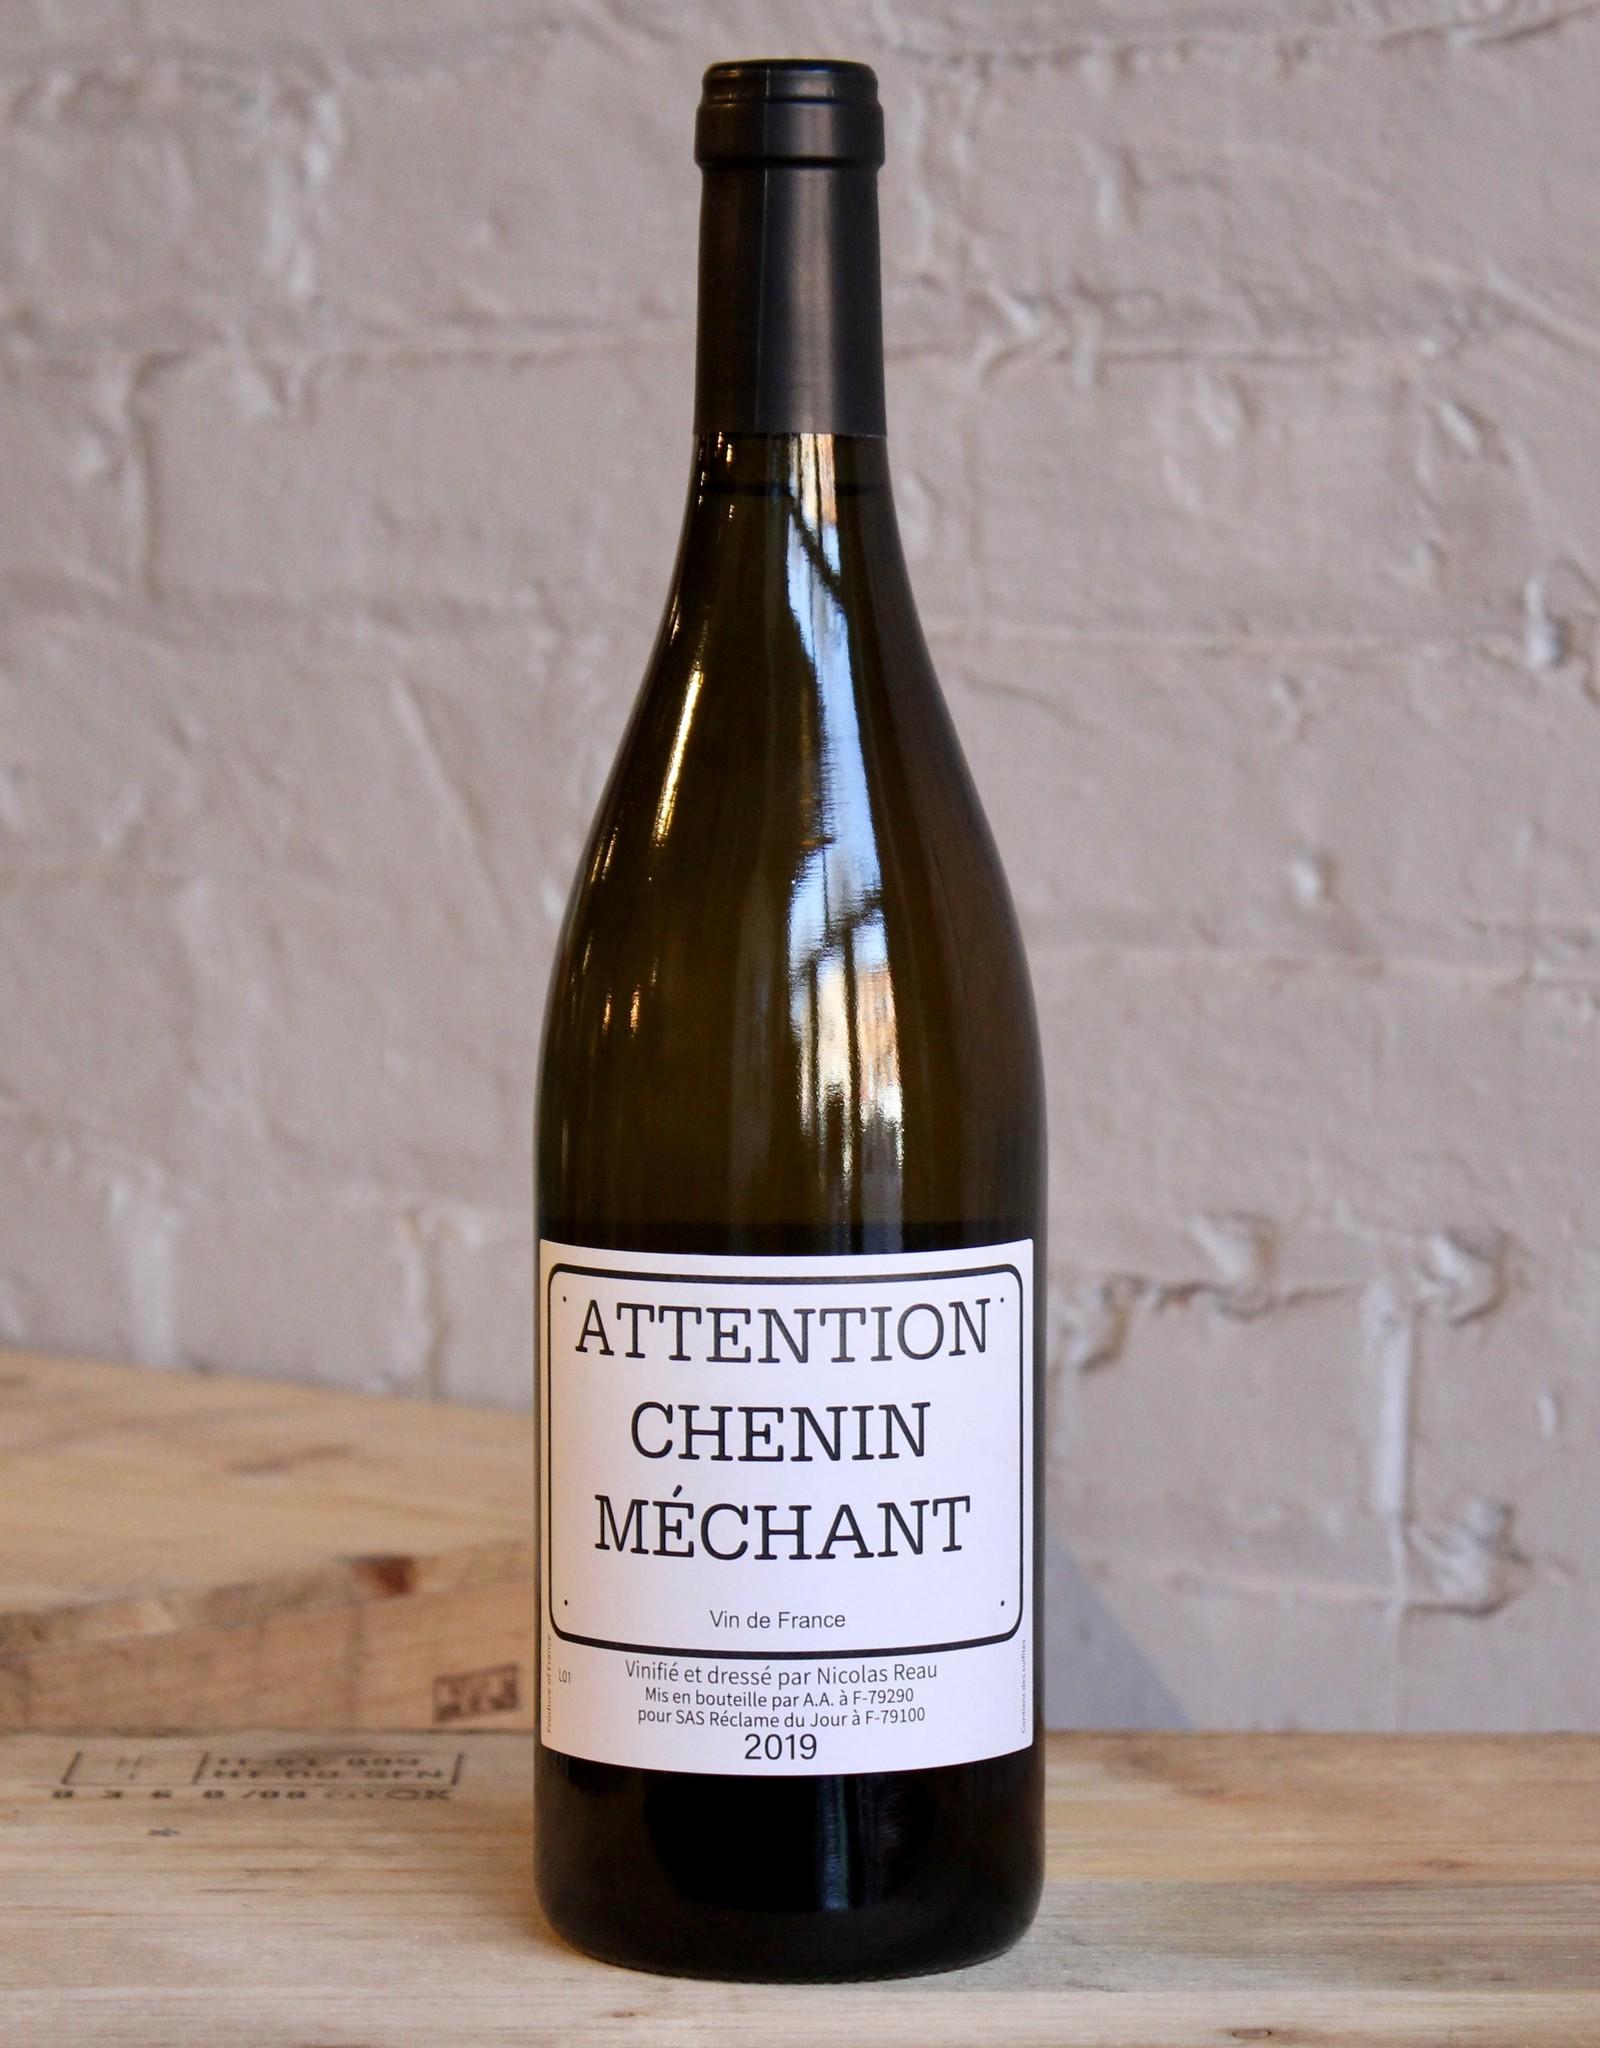 Wine 2019 Nicolas Reau Attention Chenin Méchant - Loire Valley, France (750ml)